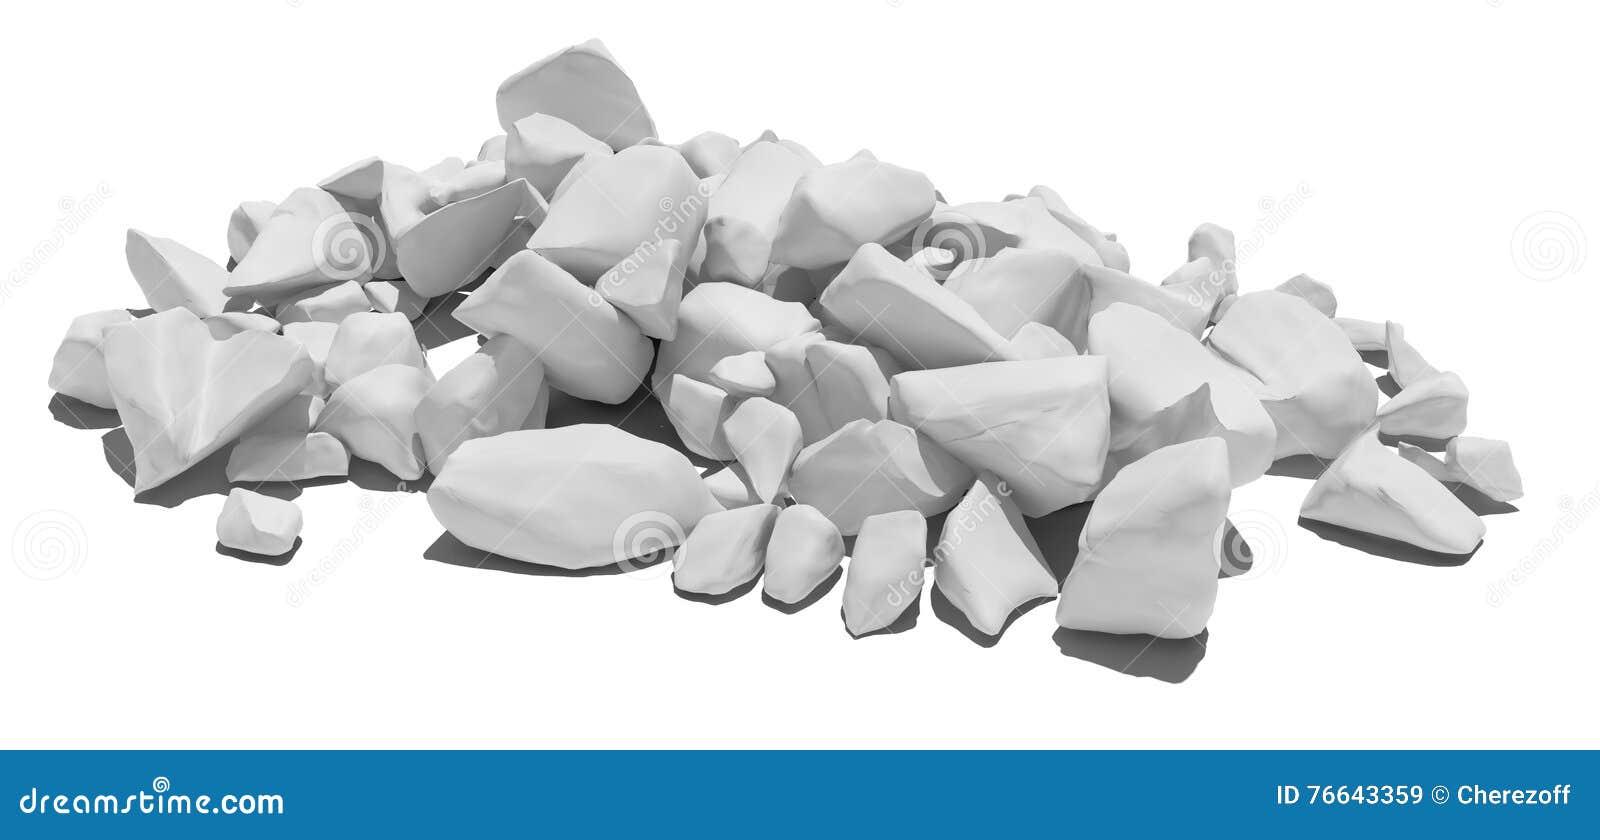 Pile Of Stone Isolated On White Background Stock